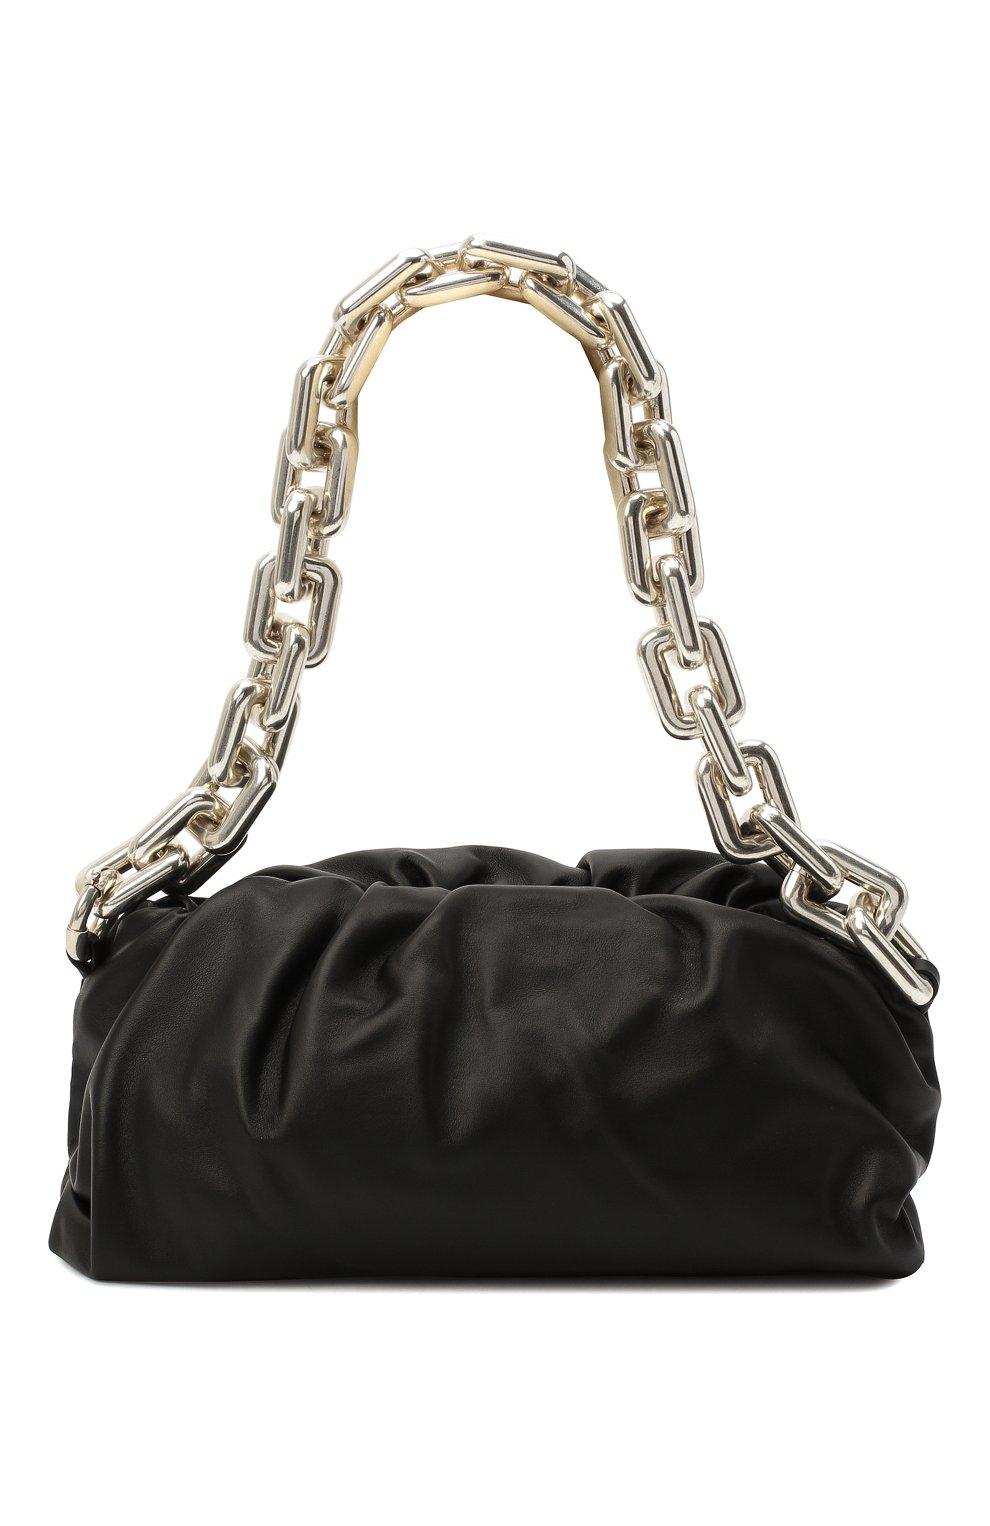 Женская сумка chain pouch BOTTEGA VENETA черного цвета, арт. 620230/VCP40 | Фото 1